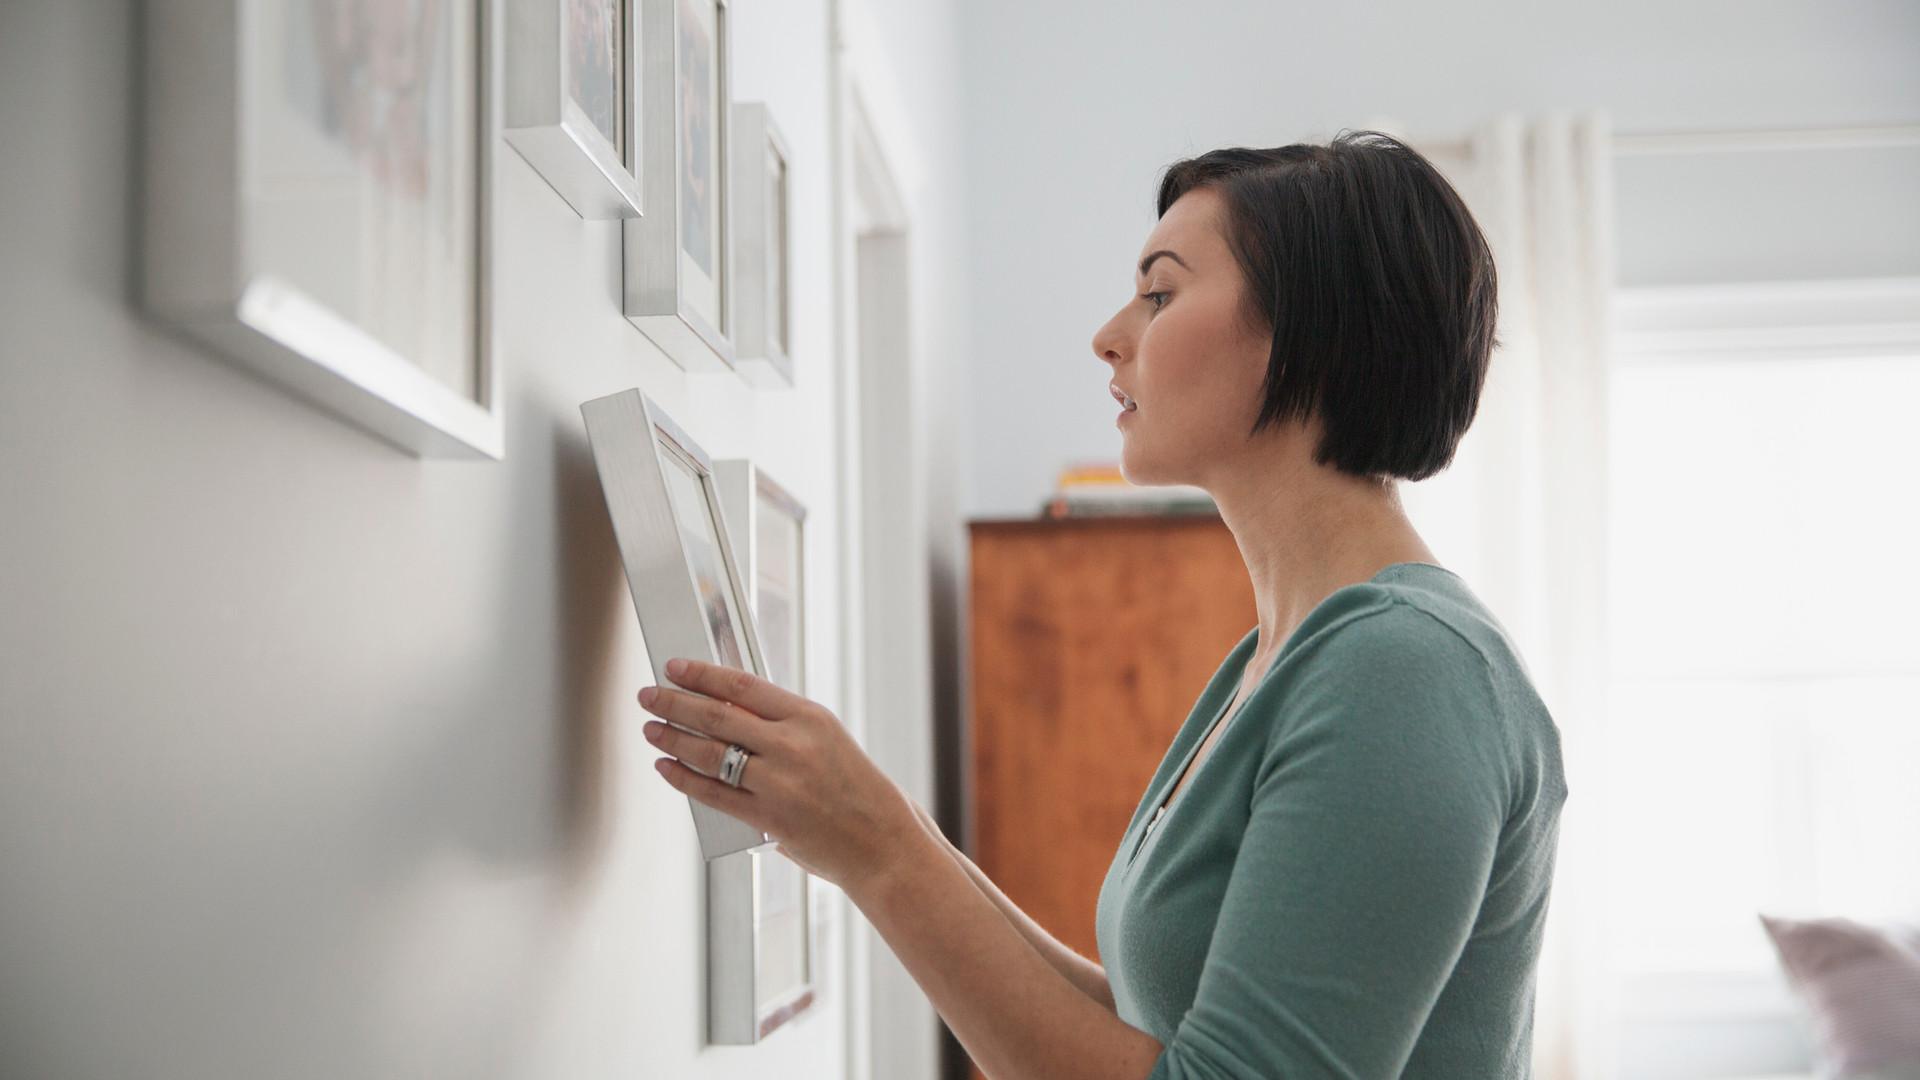 Woman Hanging Framed Photos